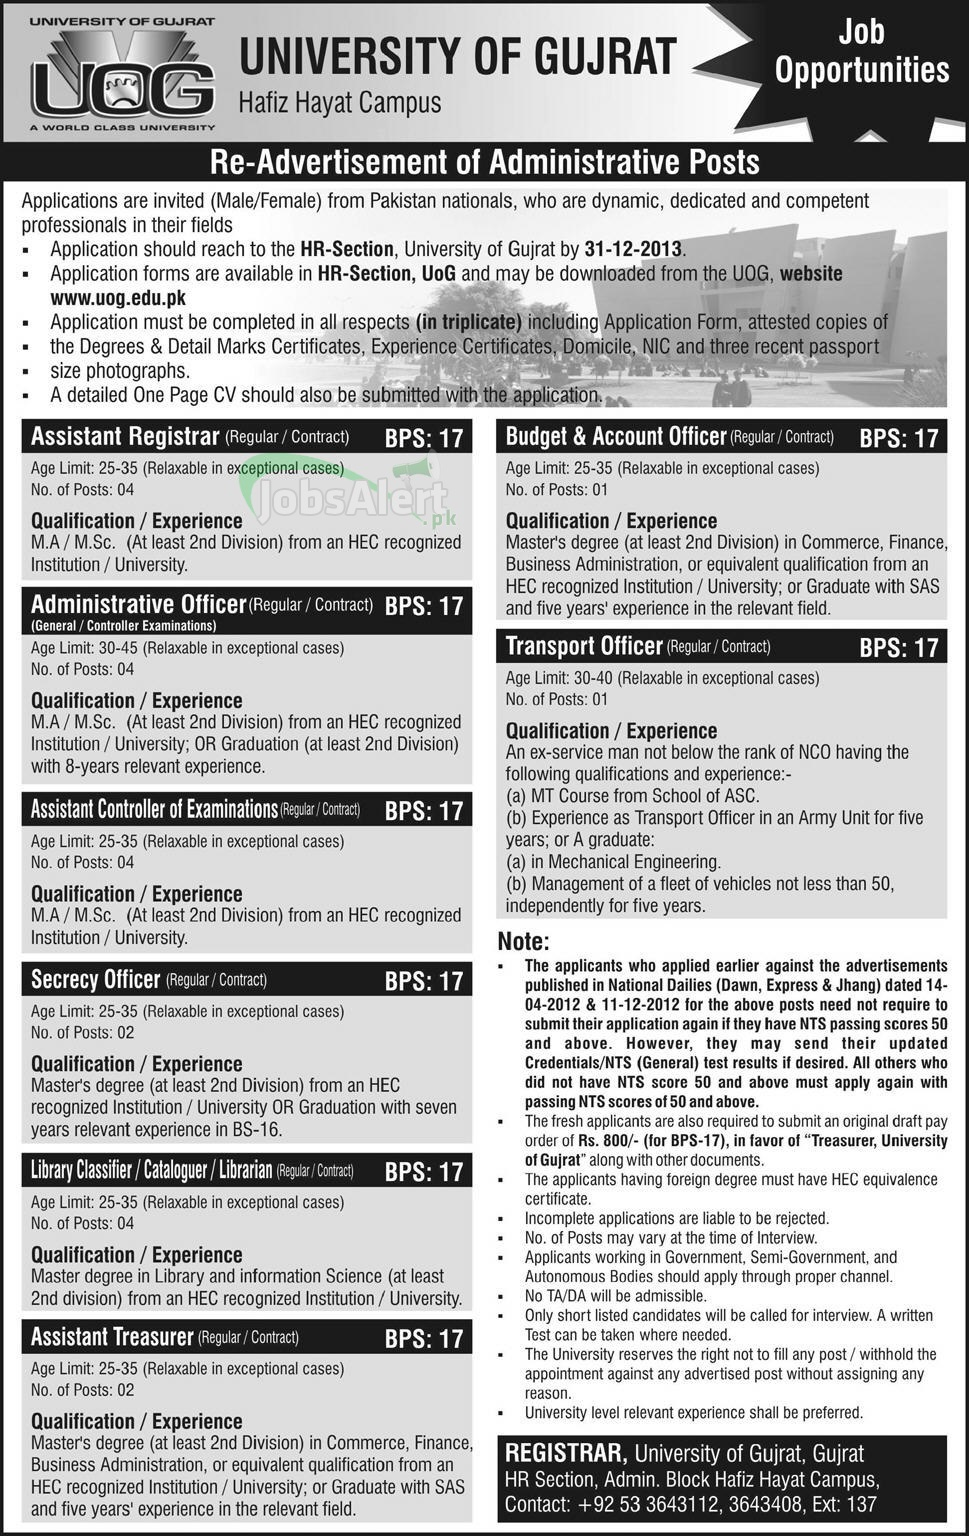 Jobs for Assistant Registrar & Admin Officer in University of Gujrat (UOG)